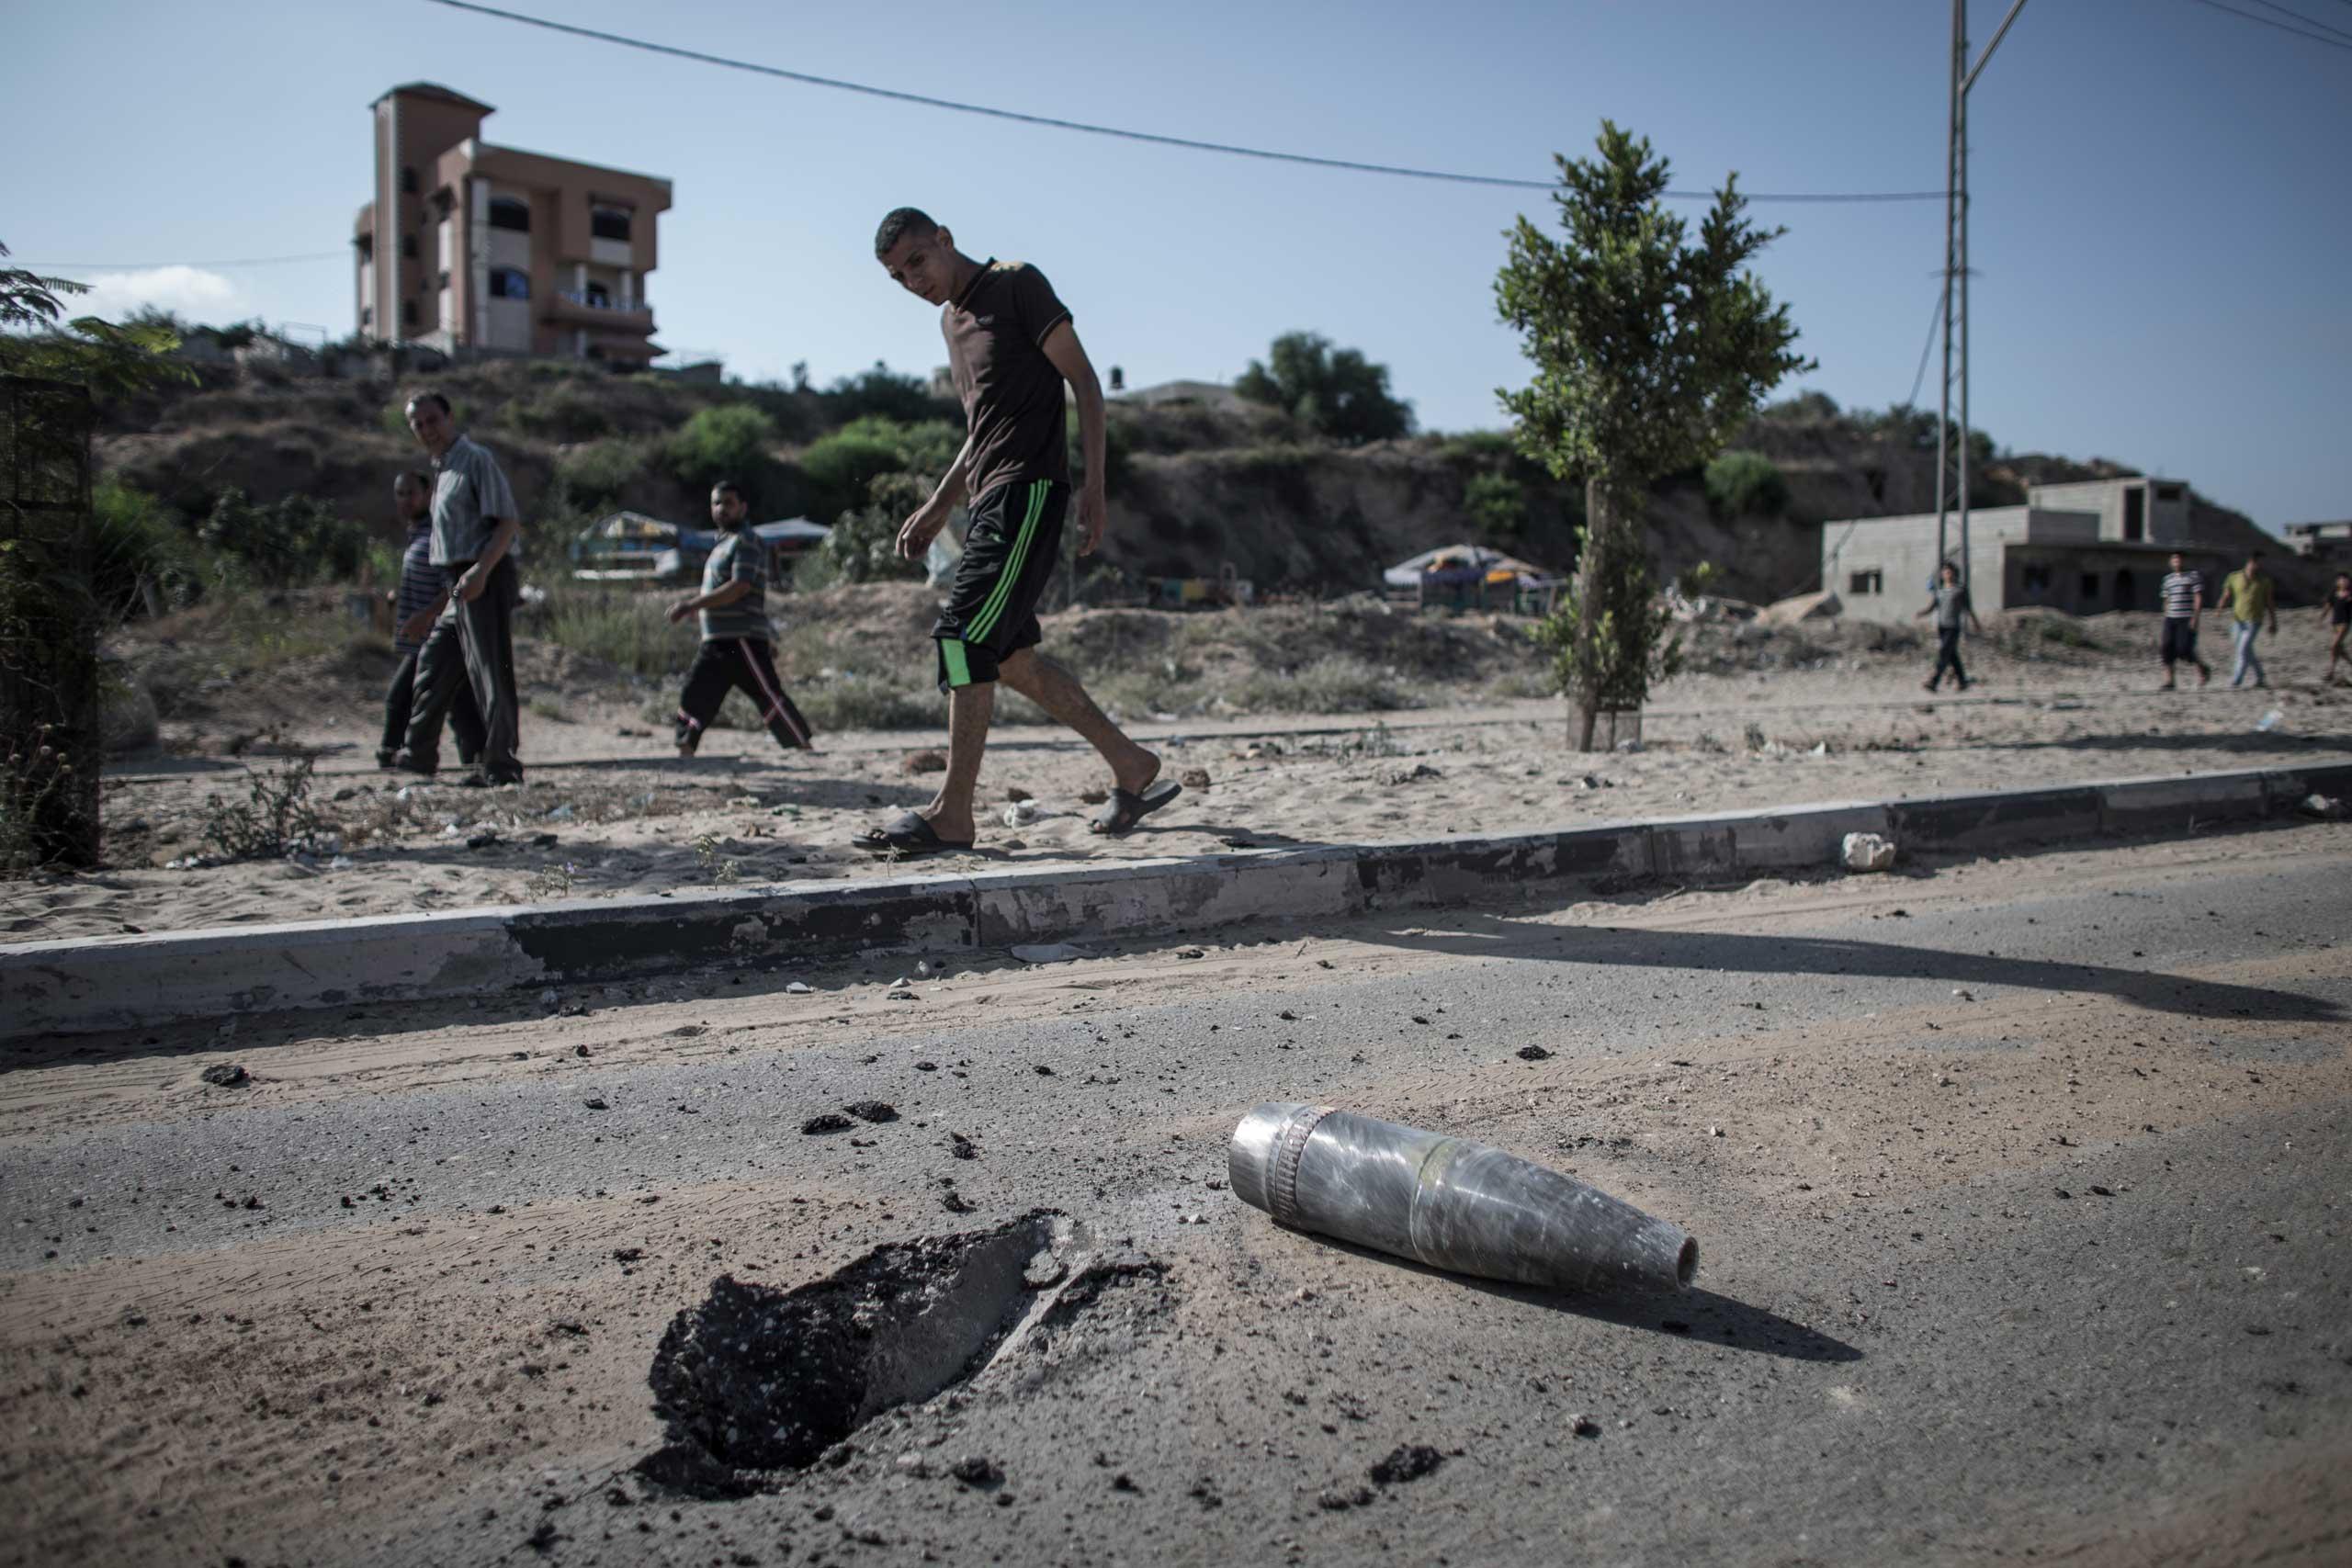 Palestinians walk past an unexploded Israeli shell outside Beit Hanoun, northern Gaza Strip, July 26, 2014.